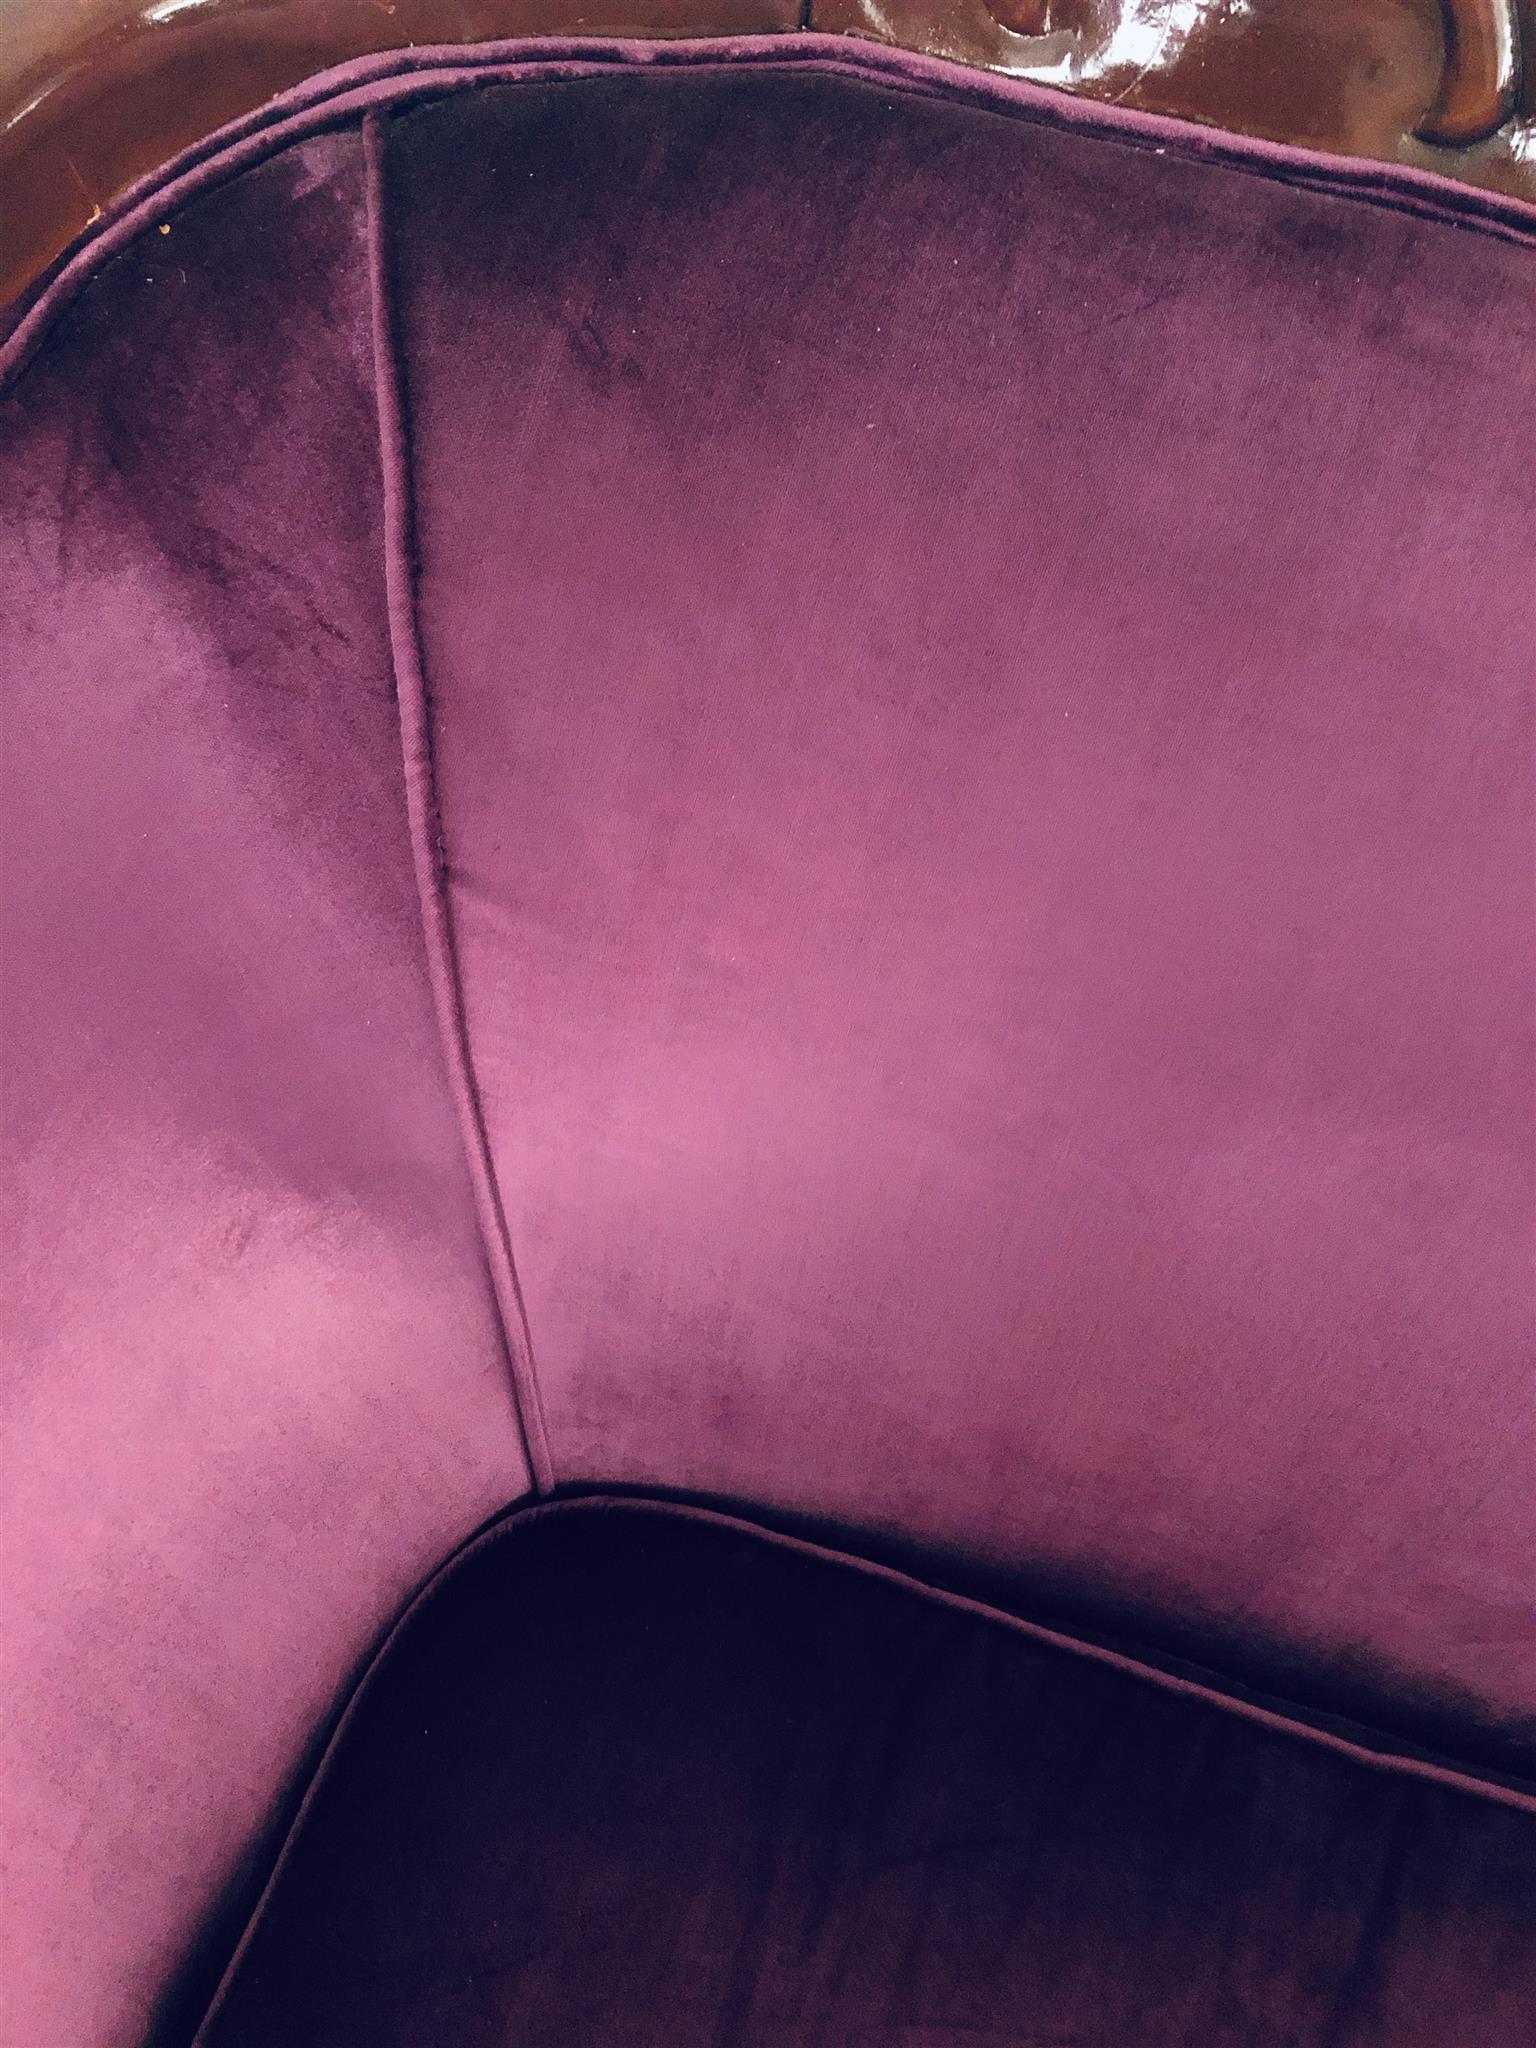 Purple Velvet Victorian couches